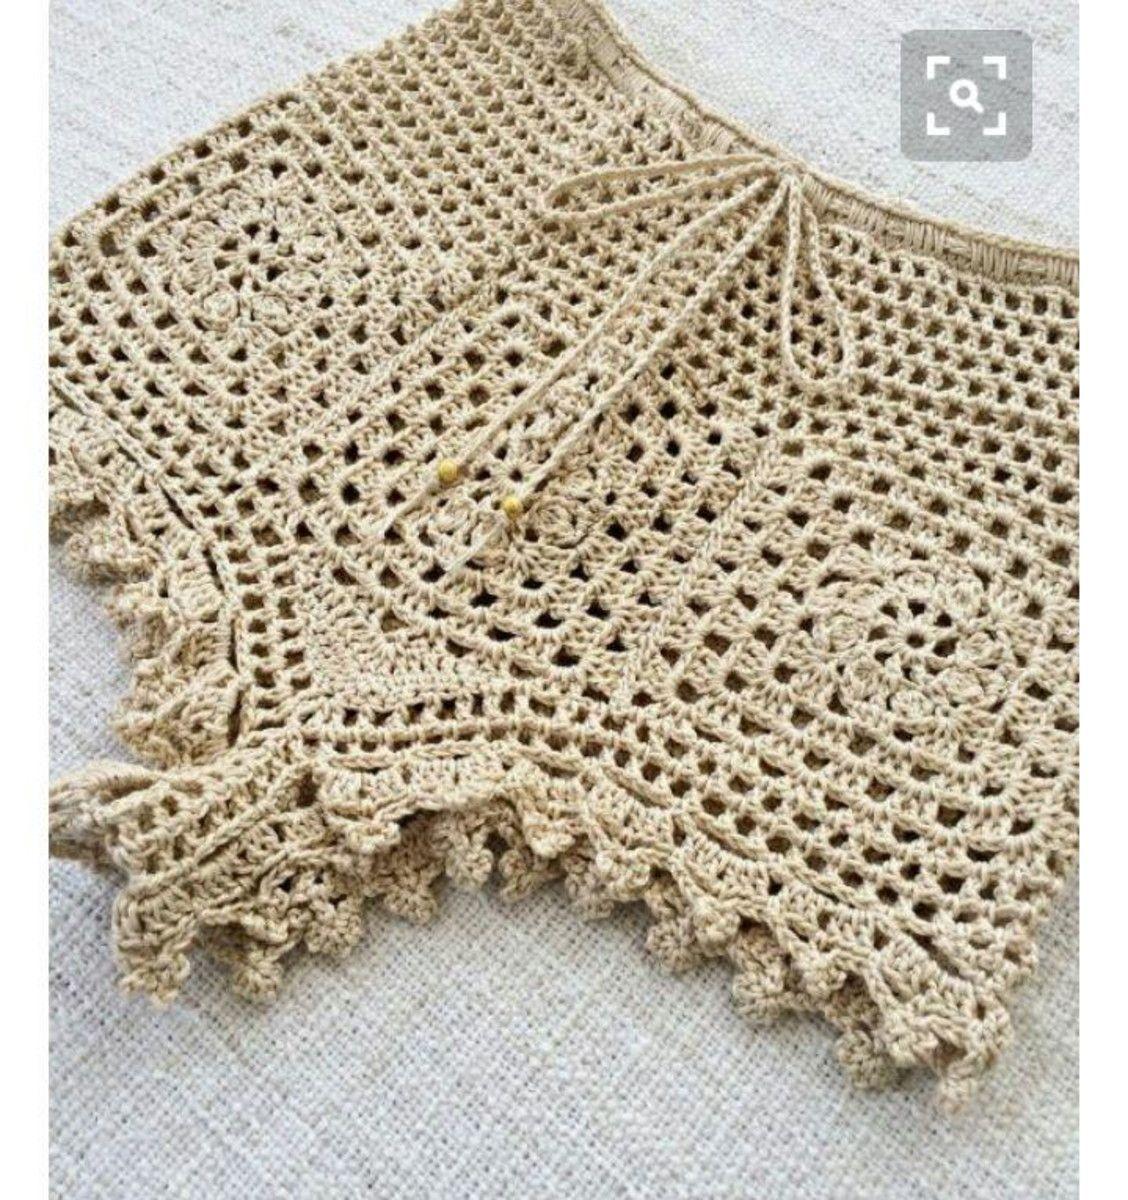 c6c446a82d91bf Short de praia em crochê   crochê Love   Short de croche, Calcinha ...